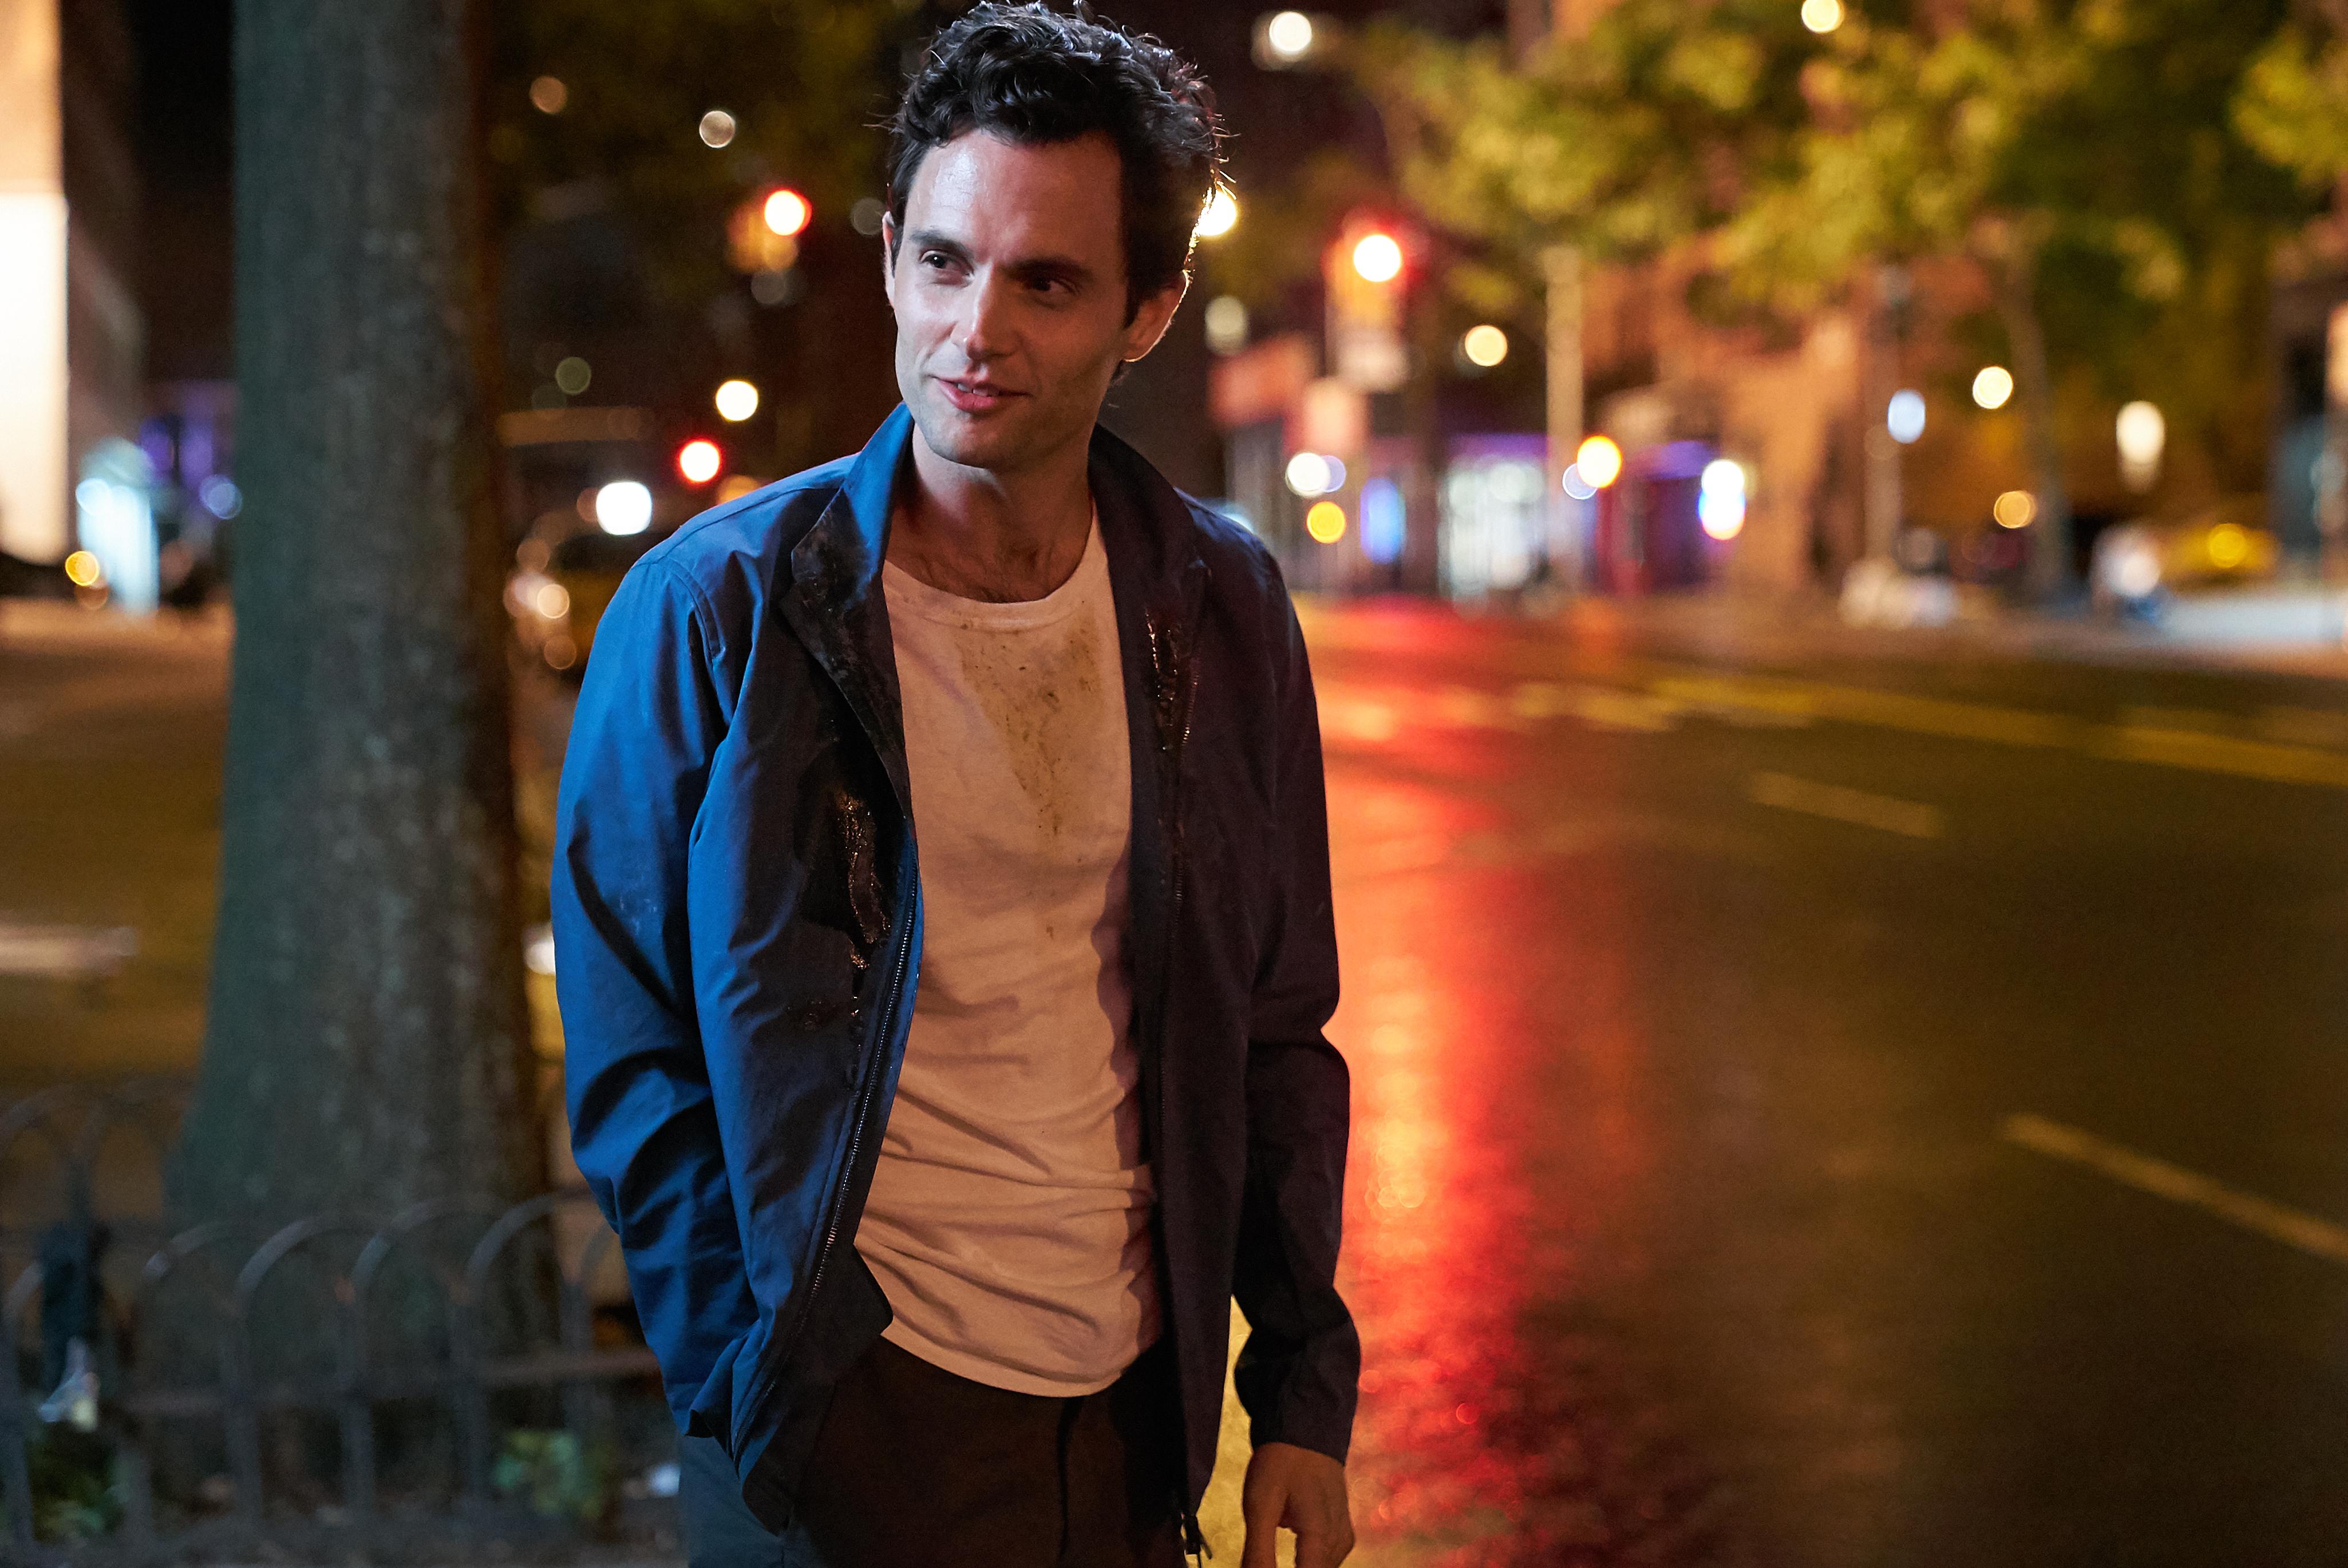 Netflix renews 'You' for a 3rd season